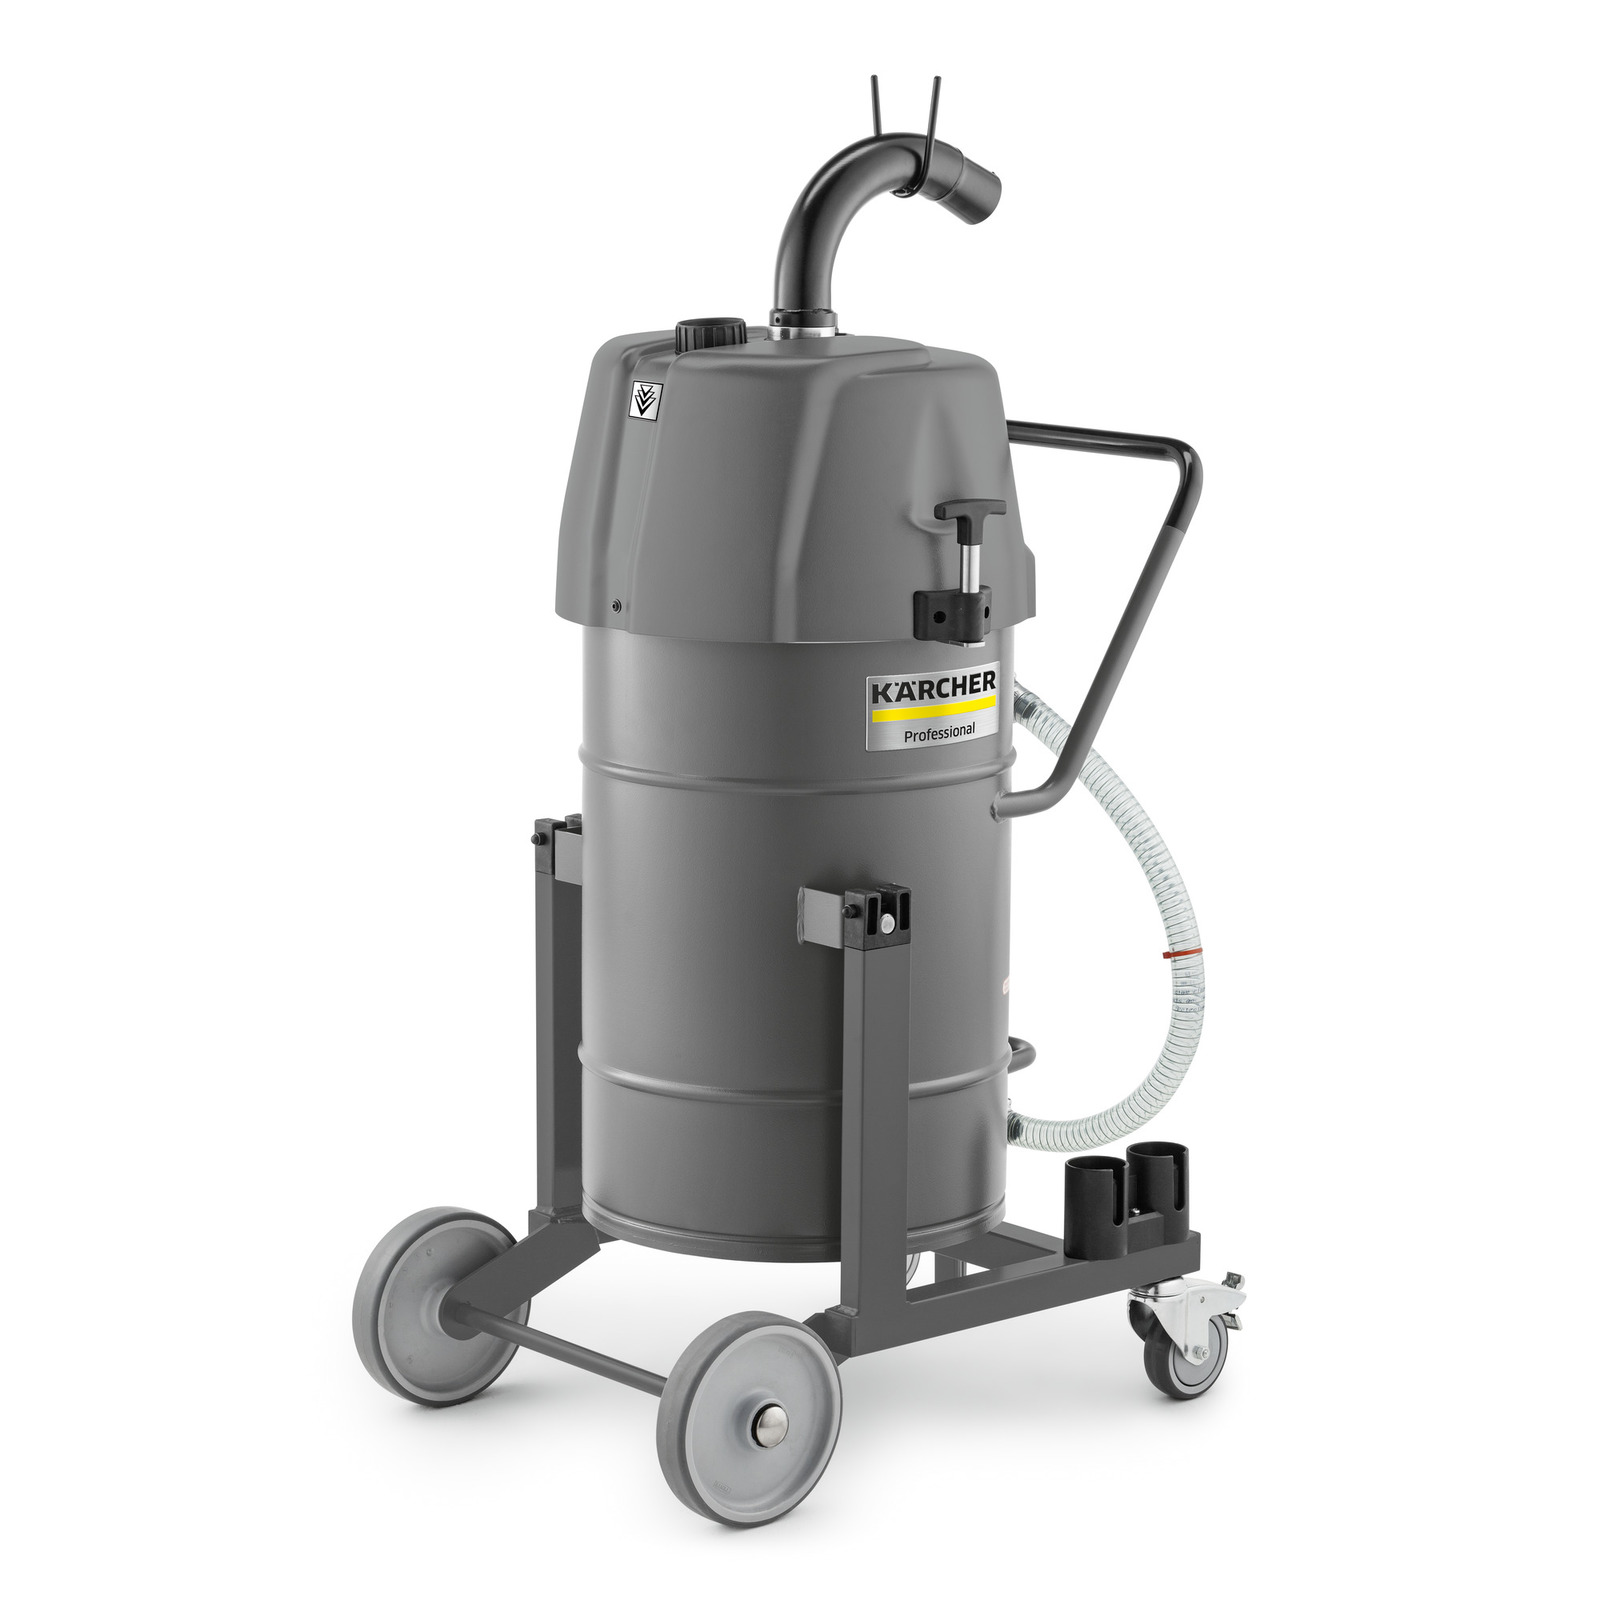 Industrial Vacuum Cleaner Ivr L 65 12 1 Tc K 228 Rcher Uk